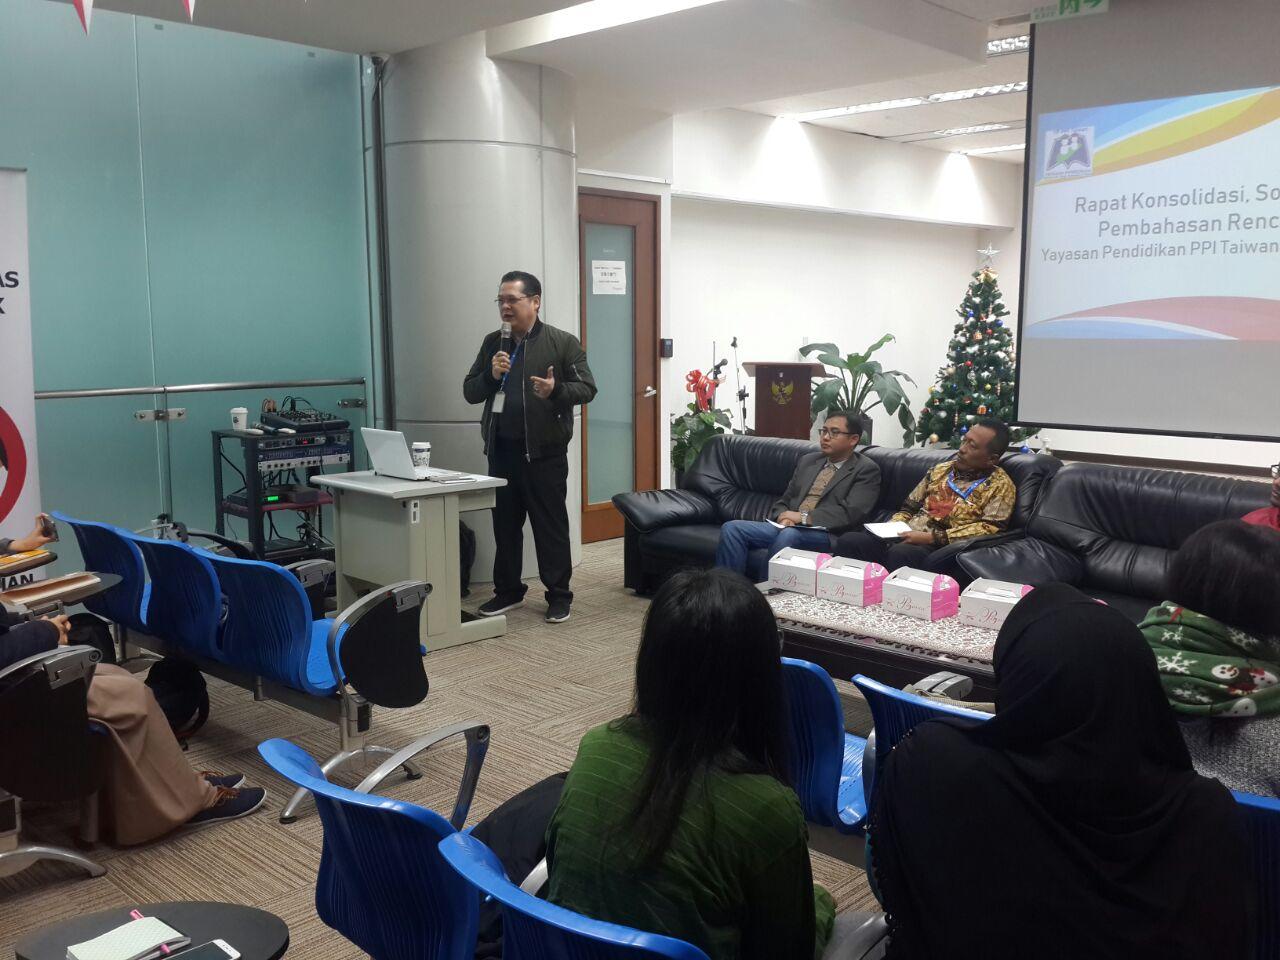 Robert James Bintaryo memberikan sambutan sekaligus membuka agenda awal tahun YP-PPI Taiwan di KDEI Taipei